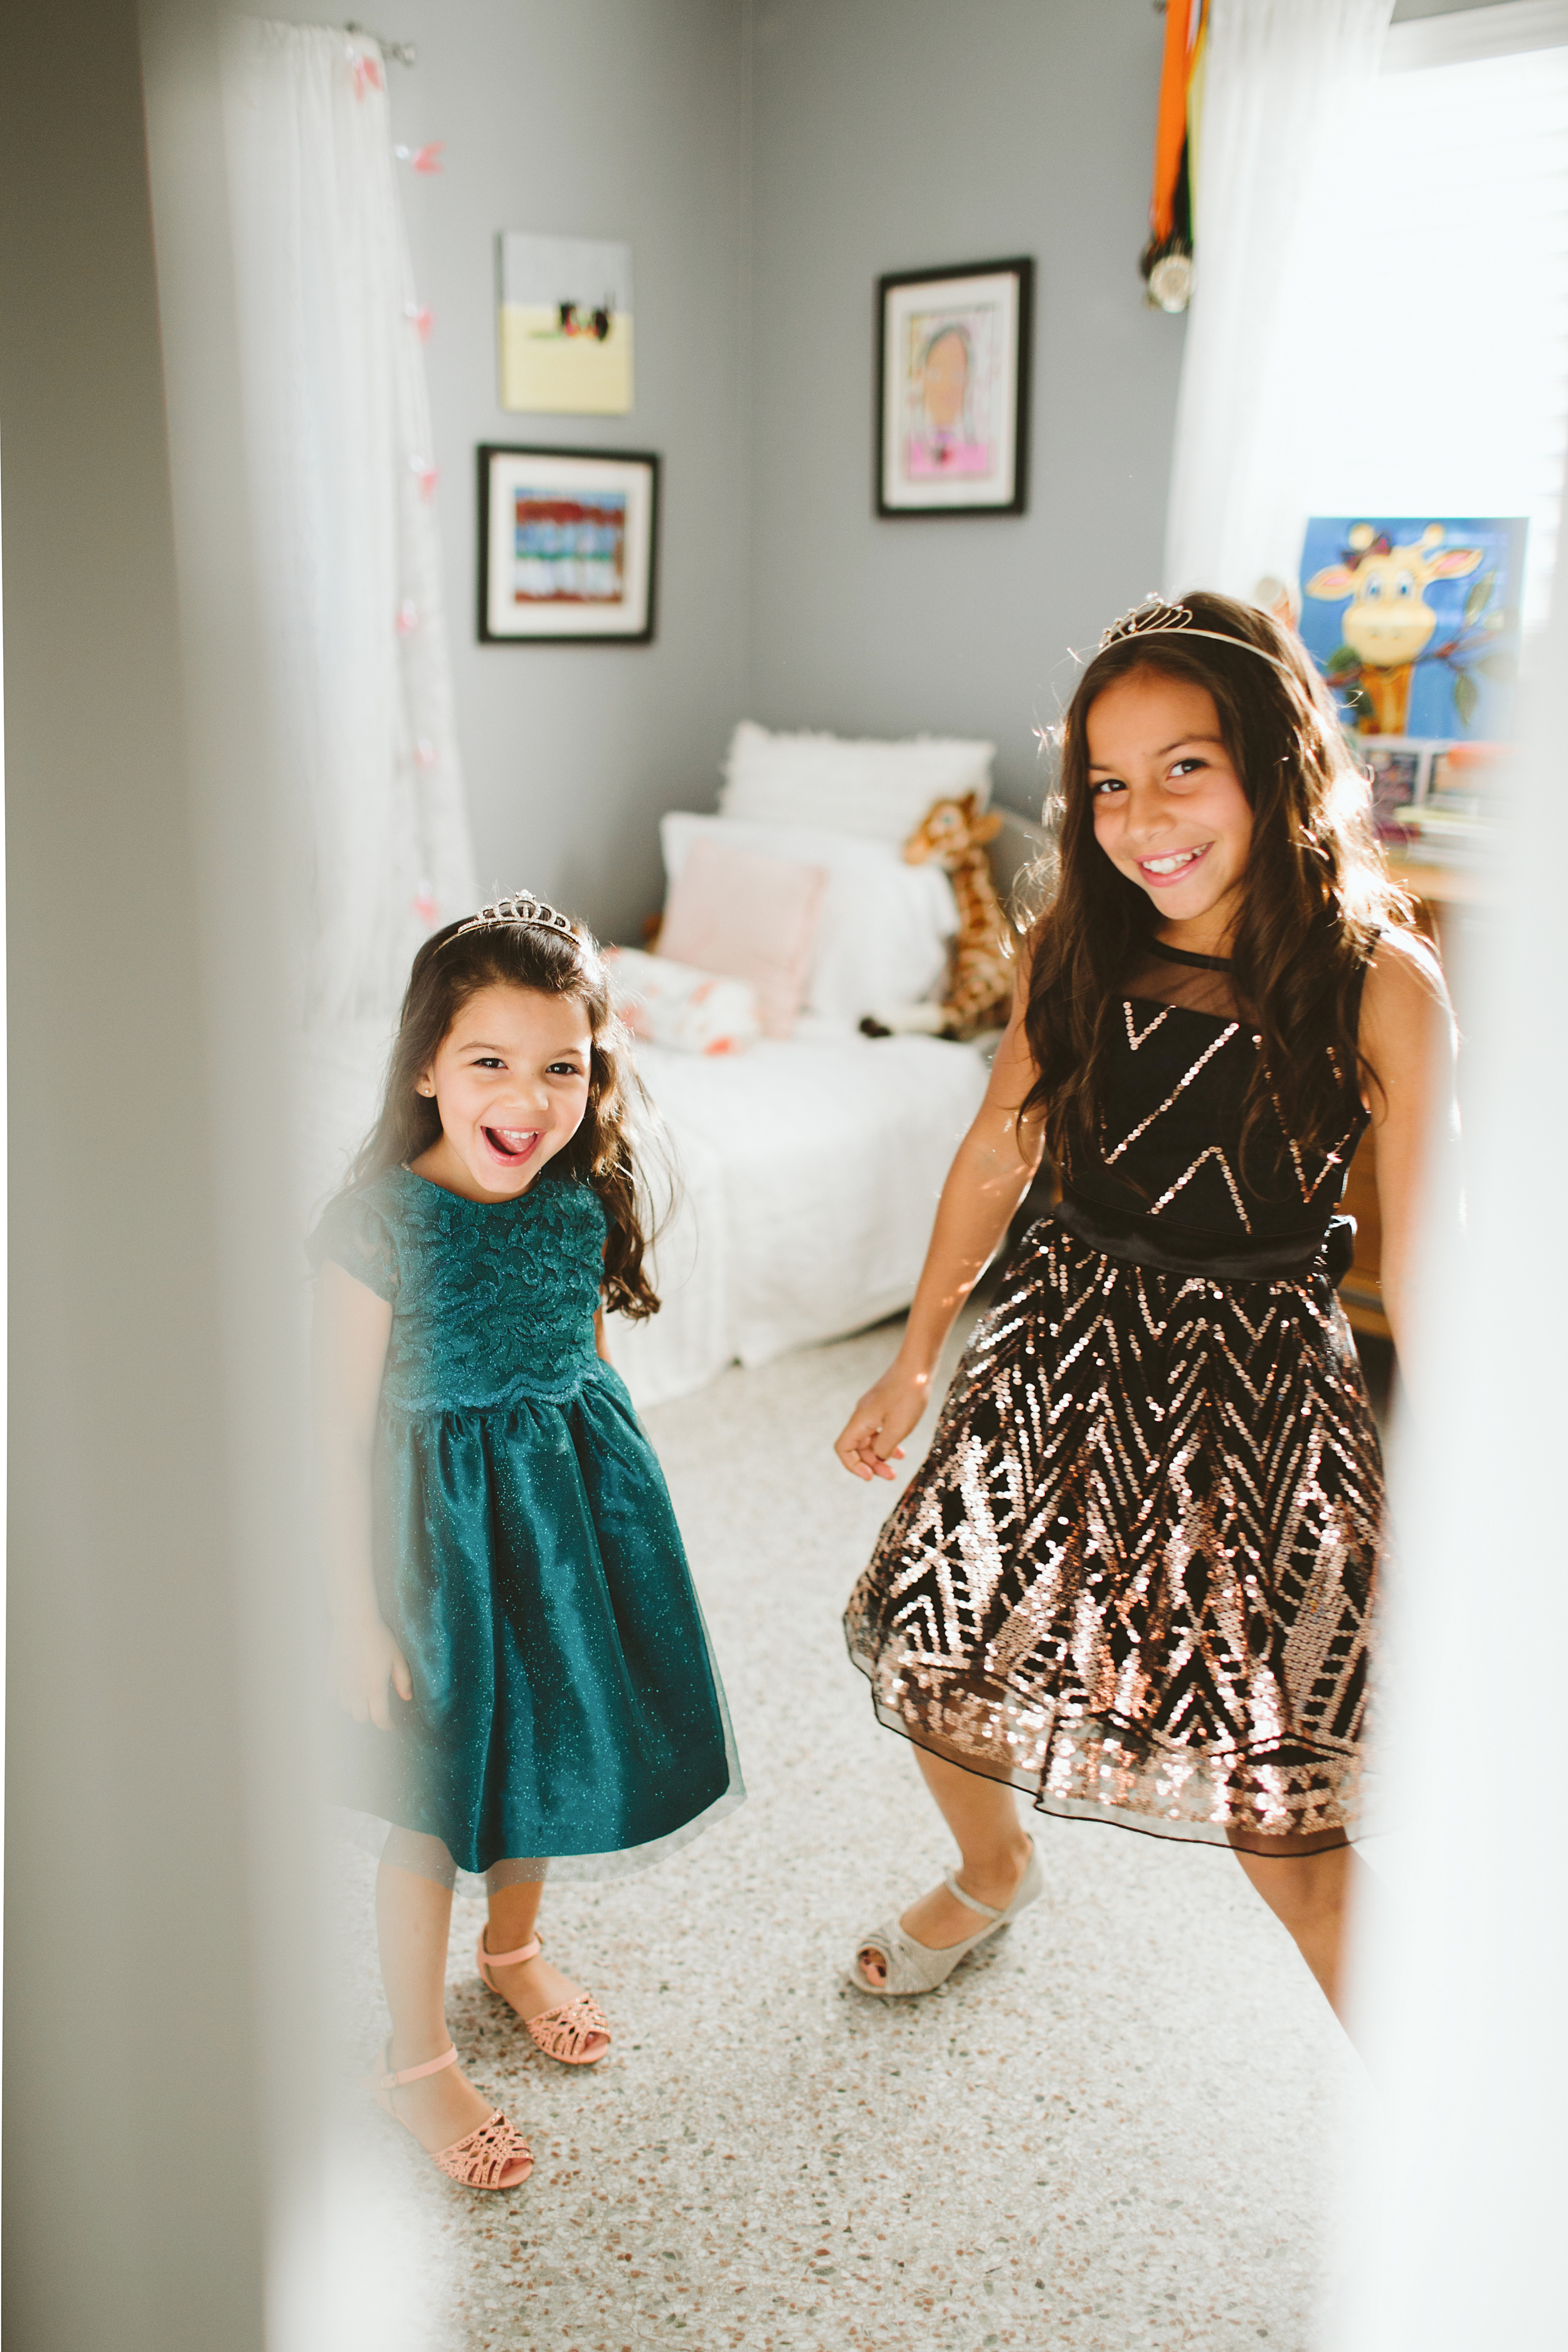 Daddy daughter dance | Vanessa Boy | vanessaboy.com